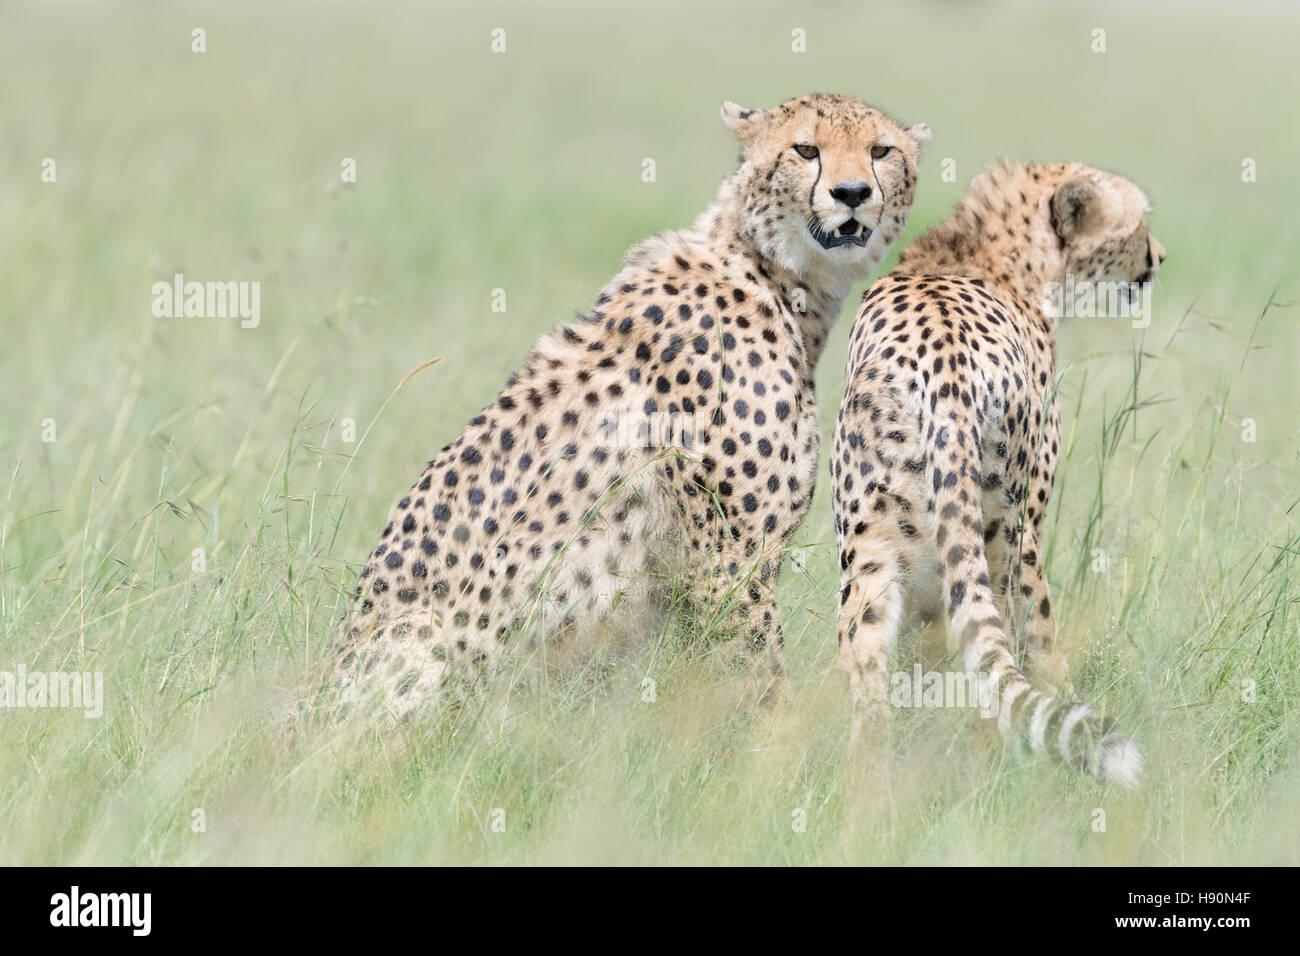 Zwei Geparden (Acinonix Jubatus) auf der Suche in Savanne, Masai Mara National Reserve, Kenia Stockbild